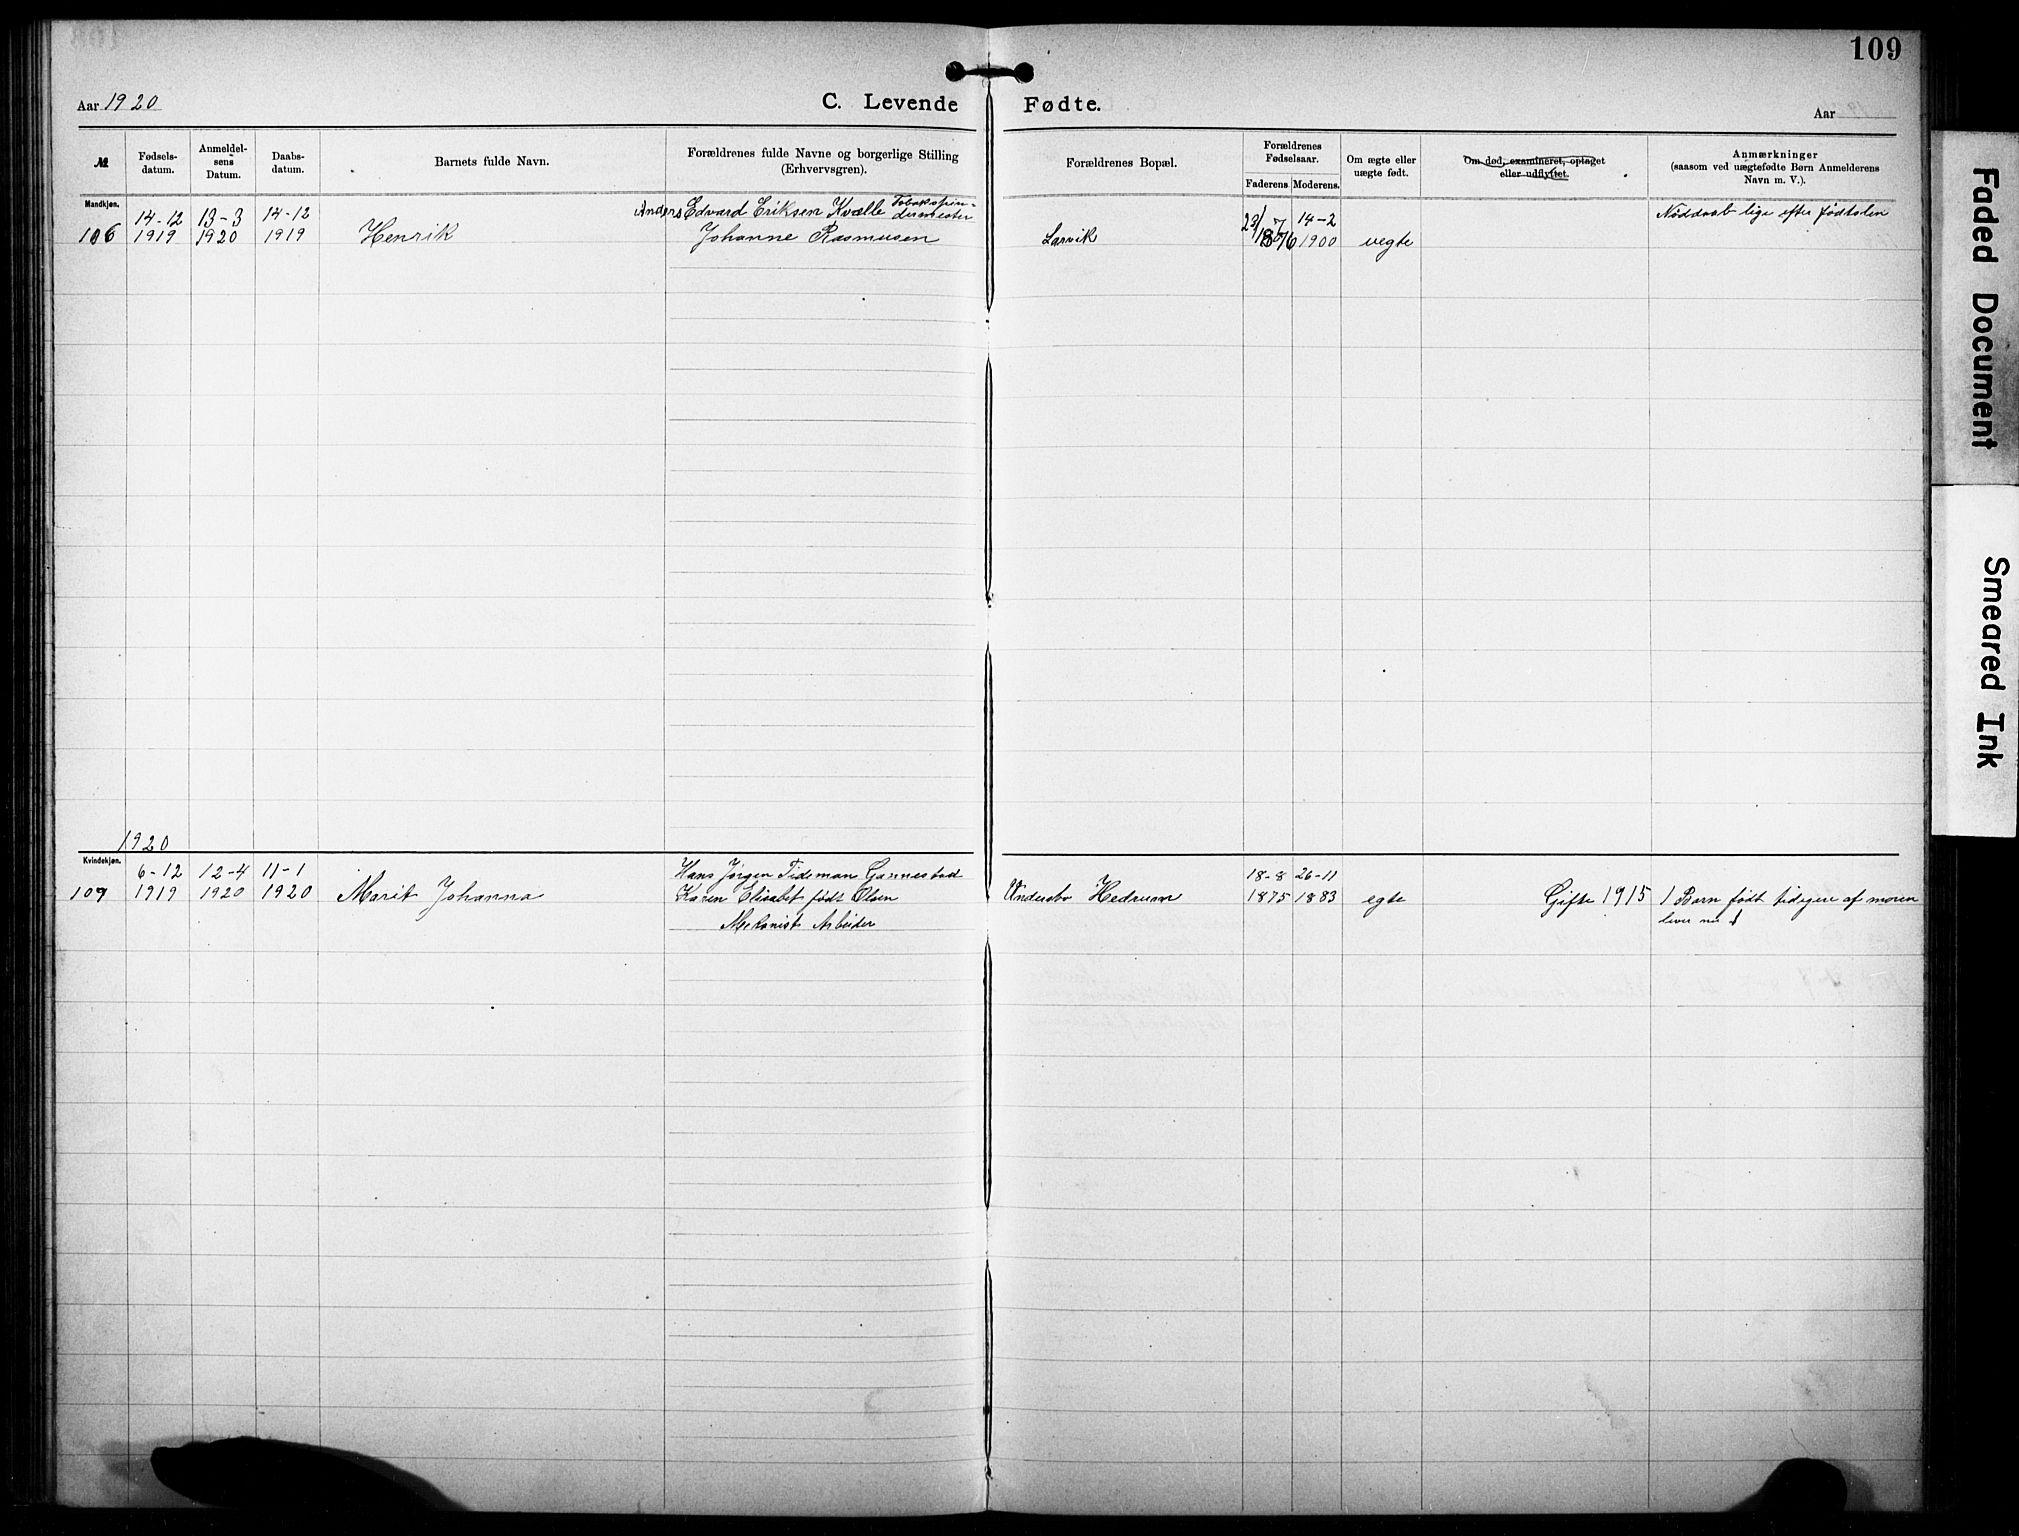 SAKO, Den katolsk-apostoliske menighet i Larvik, F/Fa/L0001: Dissenterprotokoll nr. 1, 1892-1933, s. 109